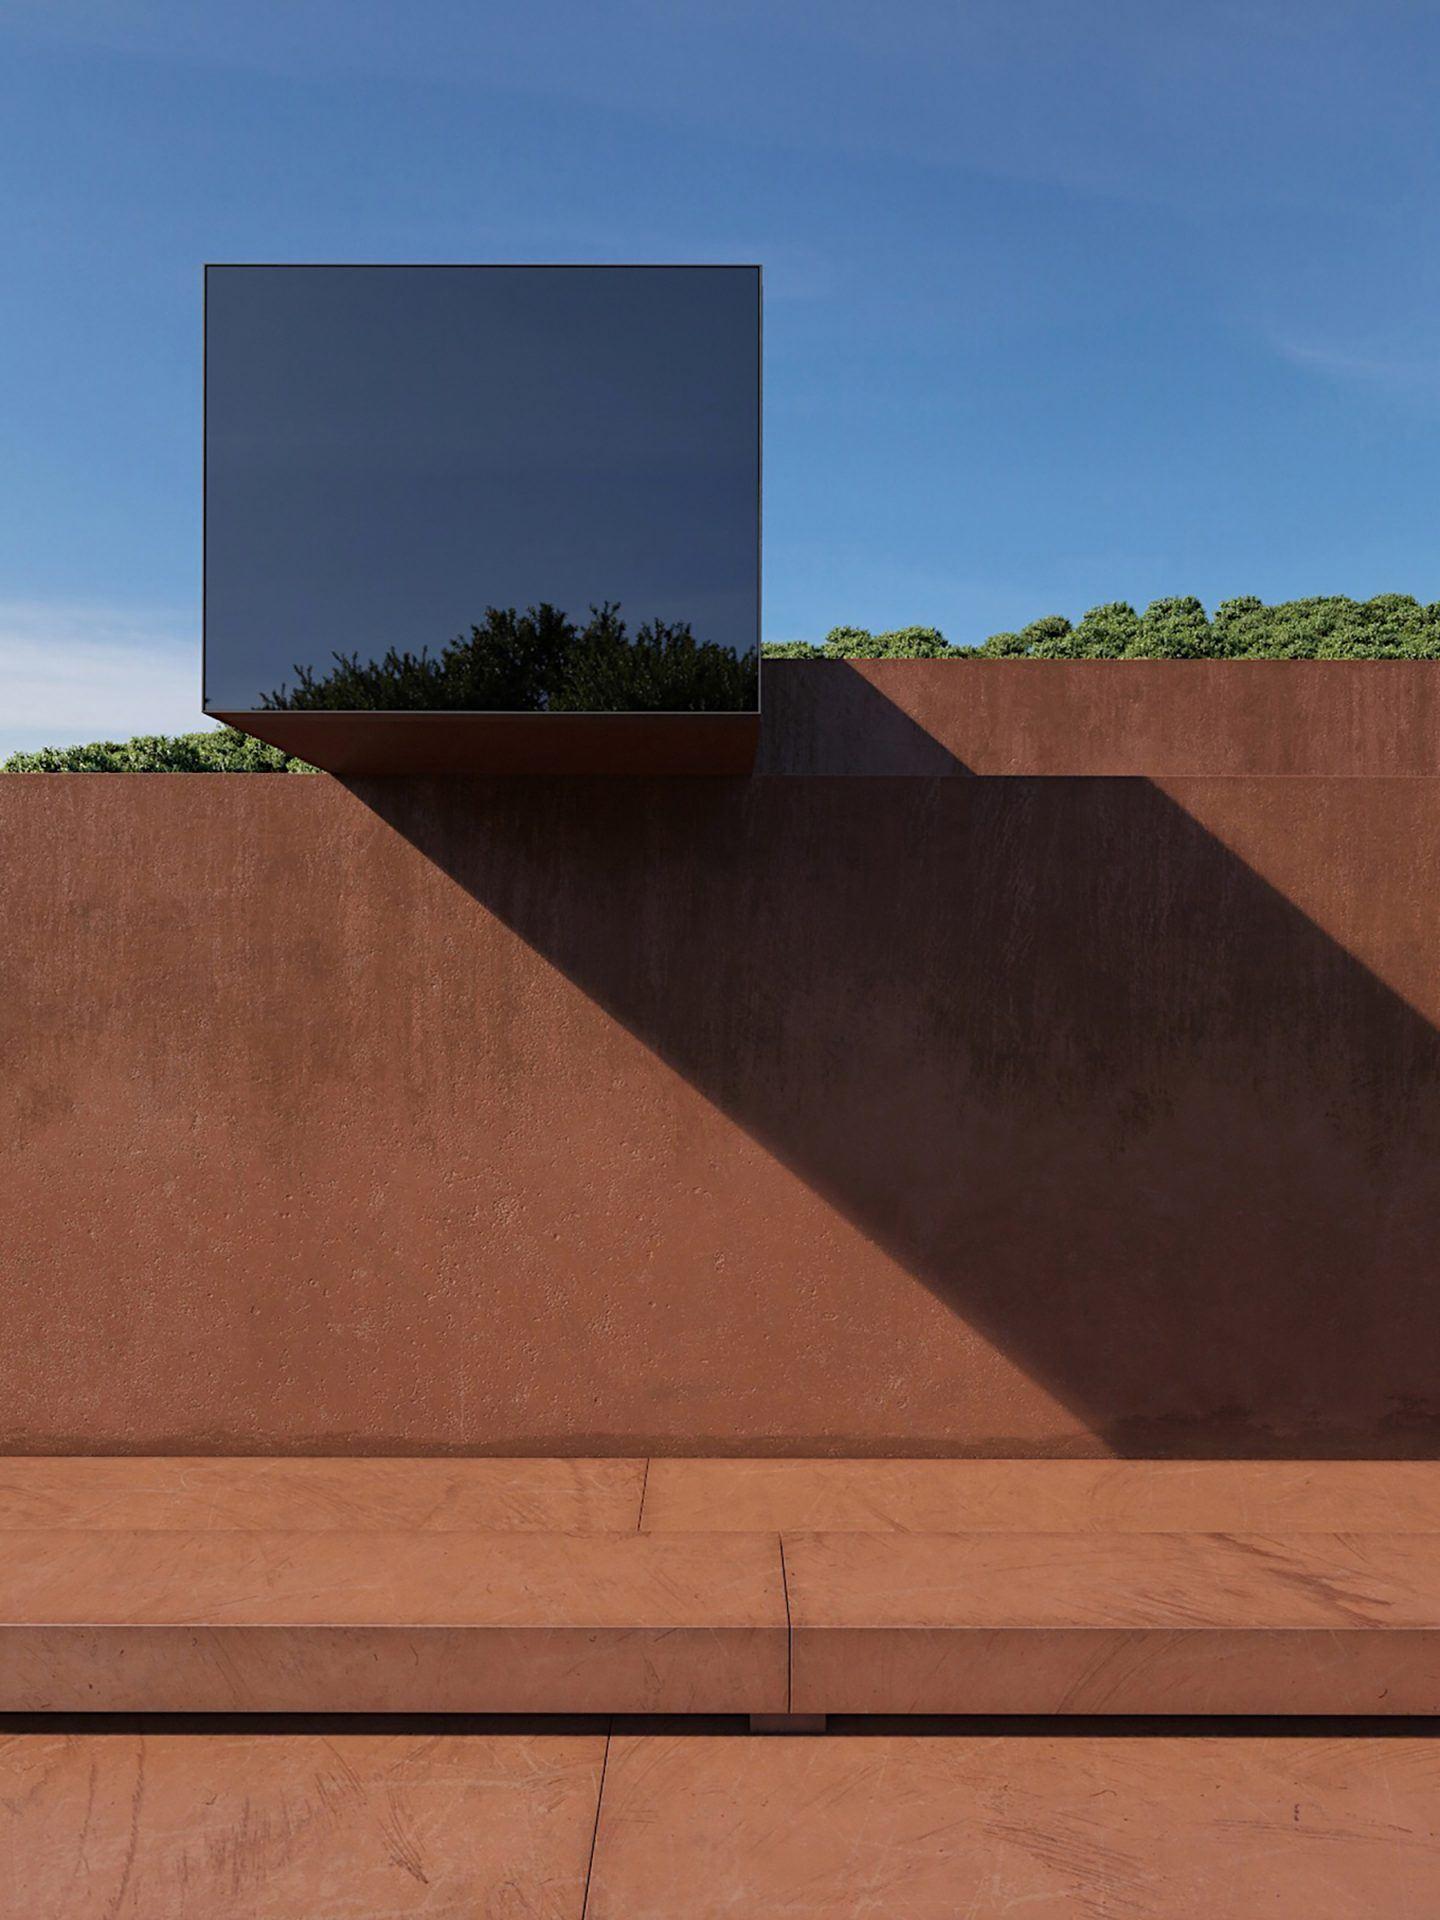 IGNANT-Architecture-SPRW-Architects-Flatness-04